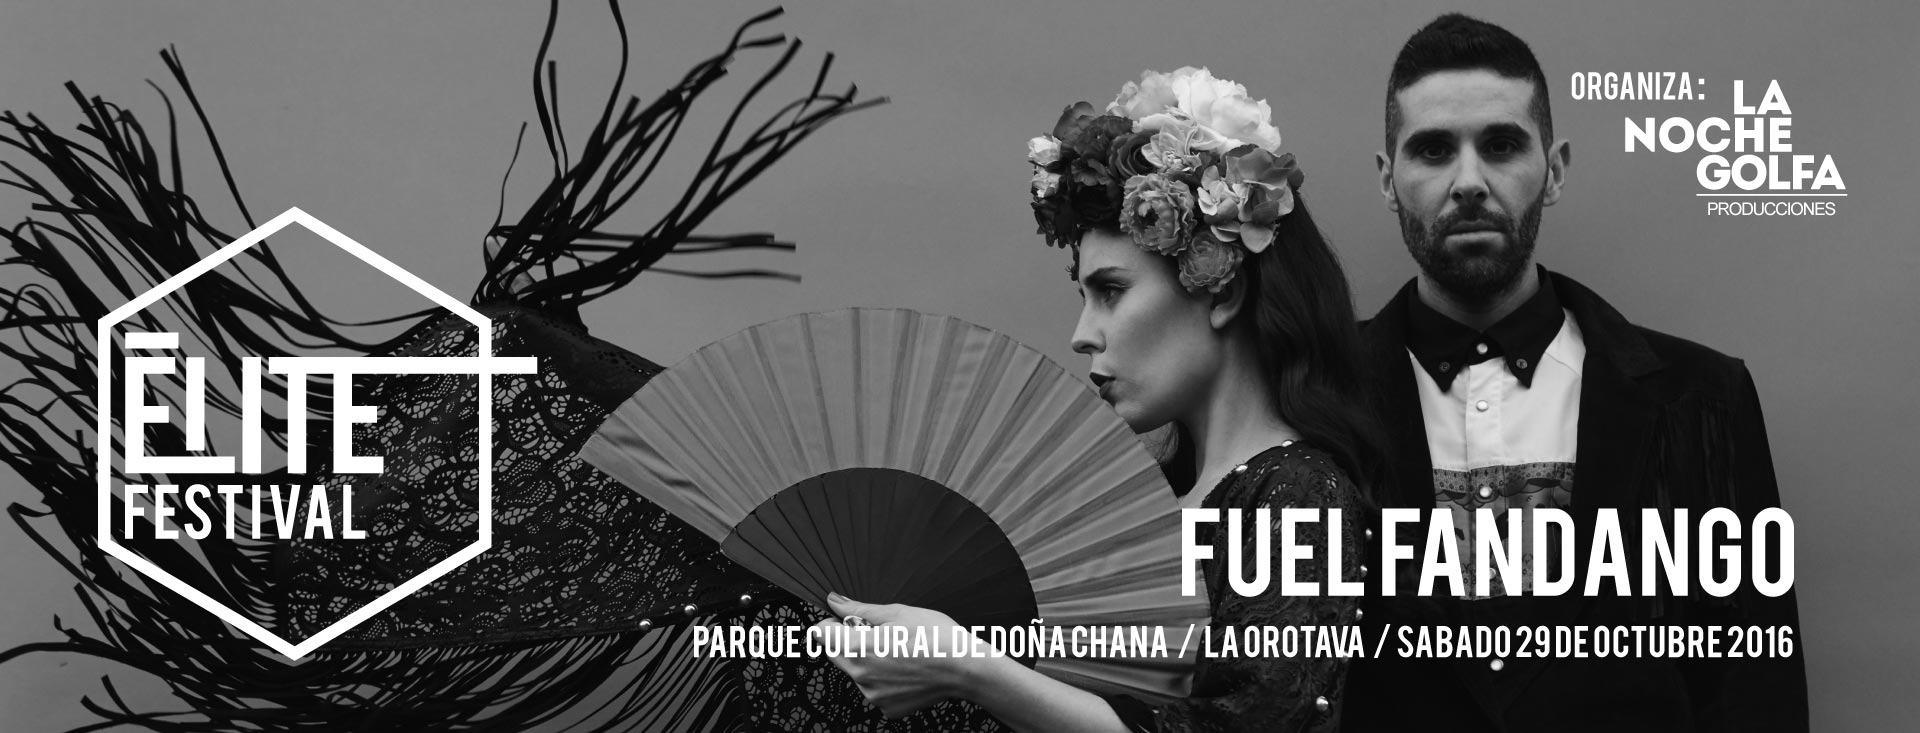 fuel_fandango_1920